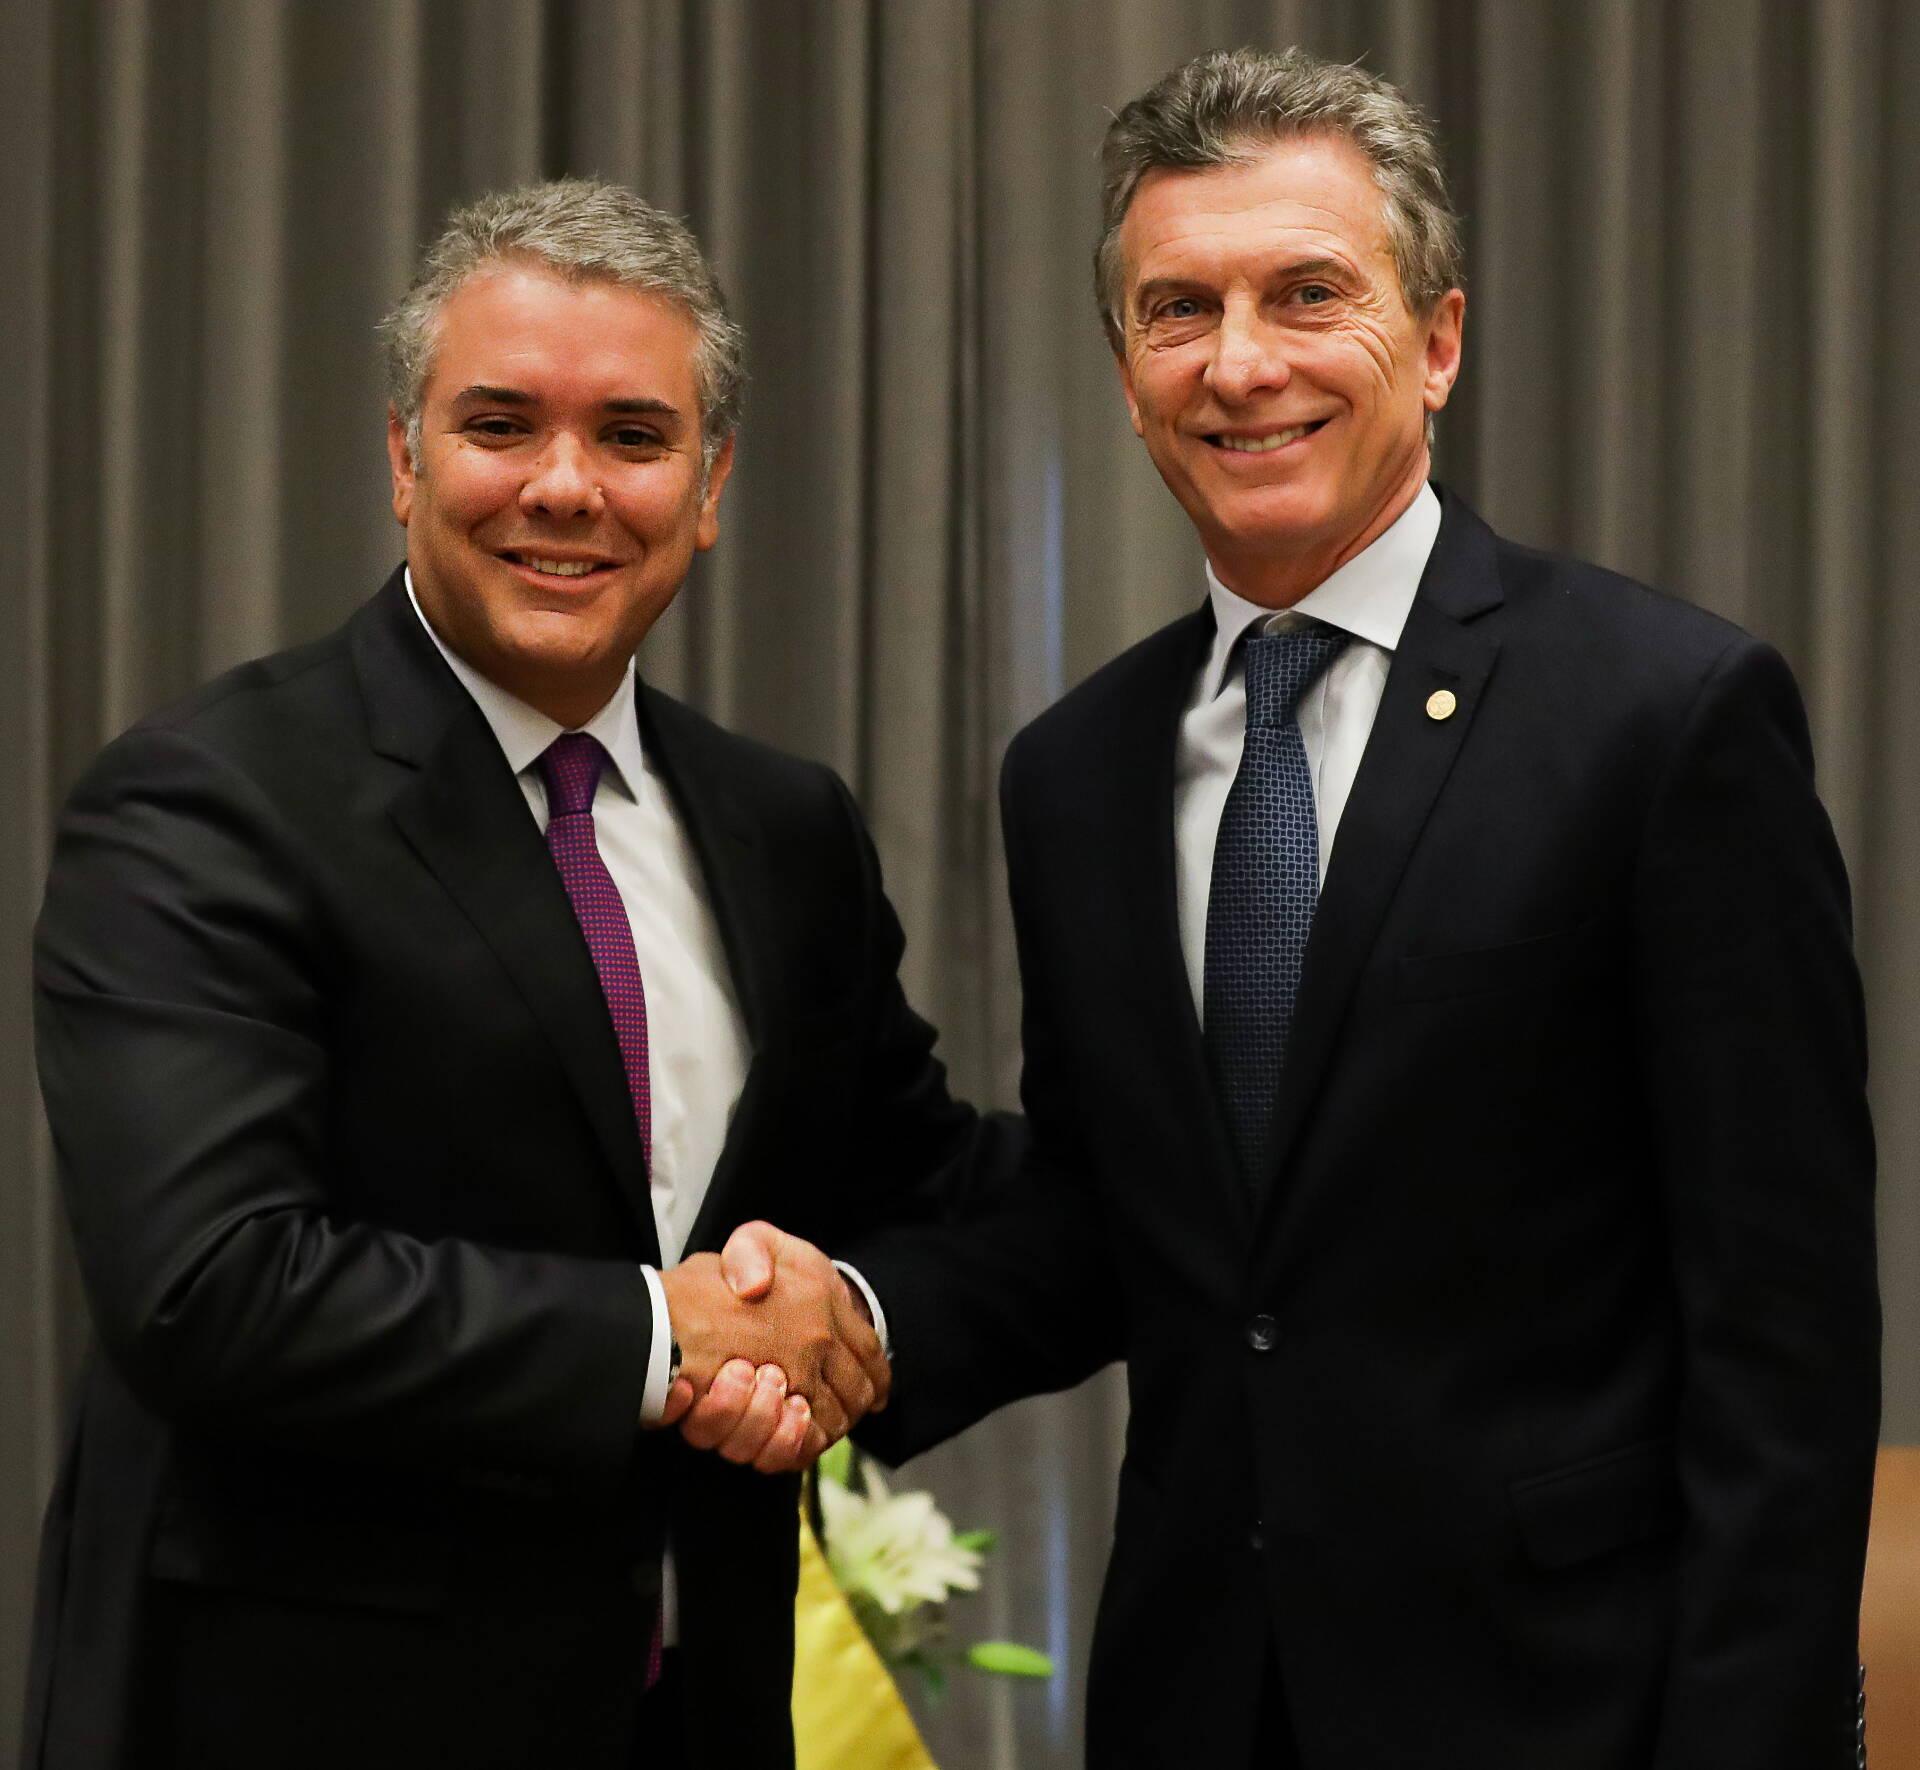 File:Macri & Duque 01.jpg - Wikimedia Commons